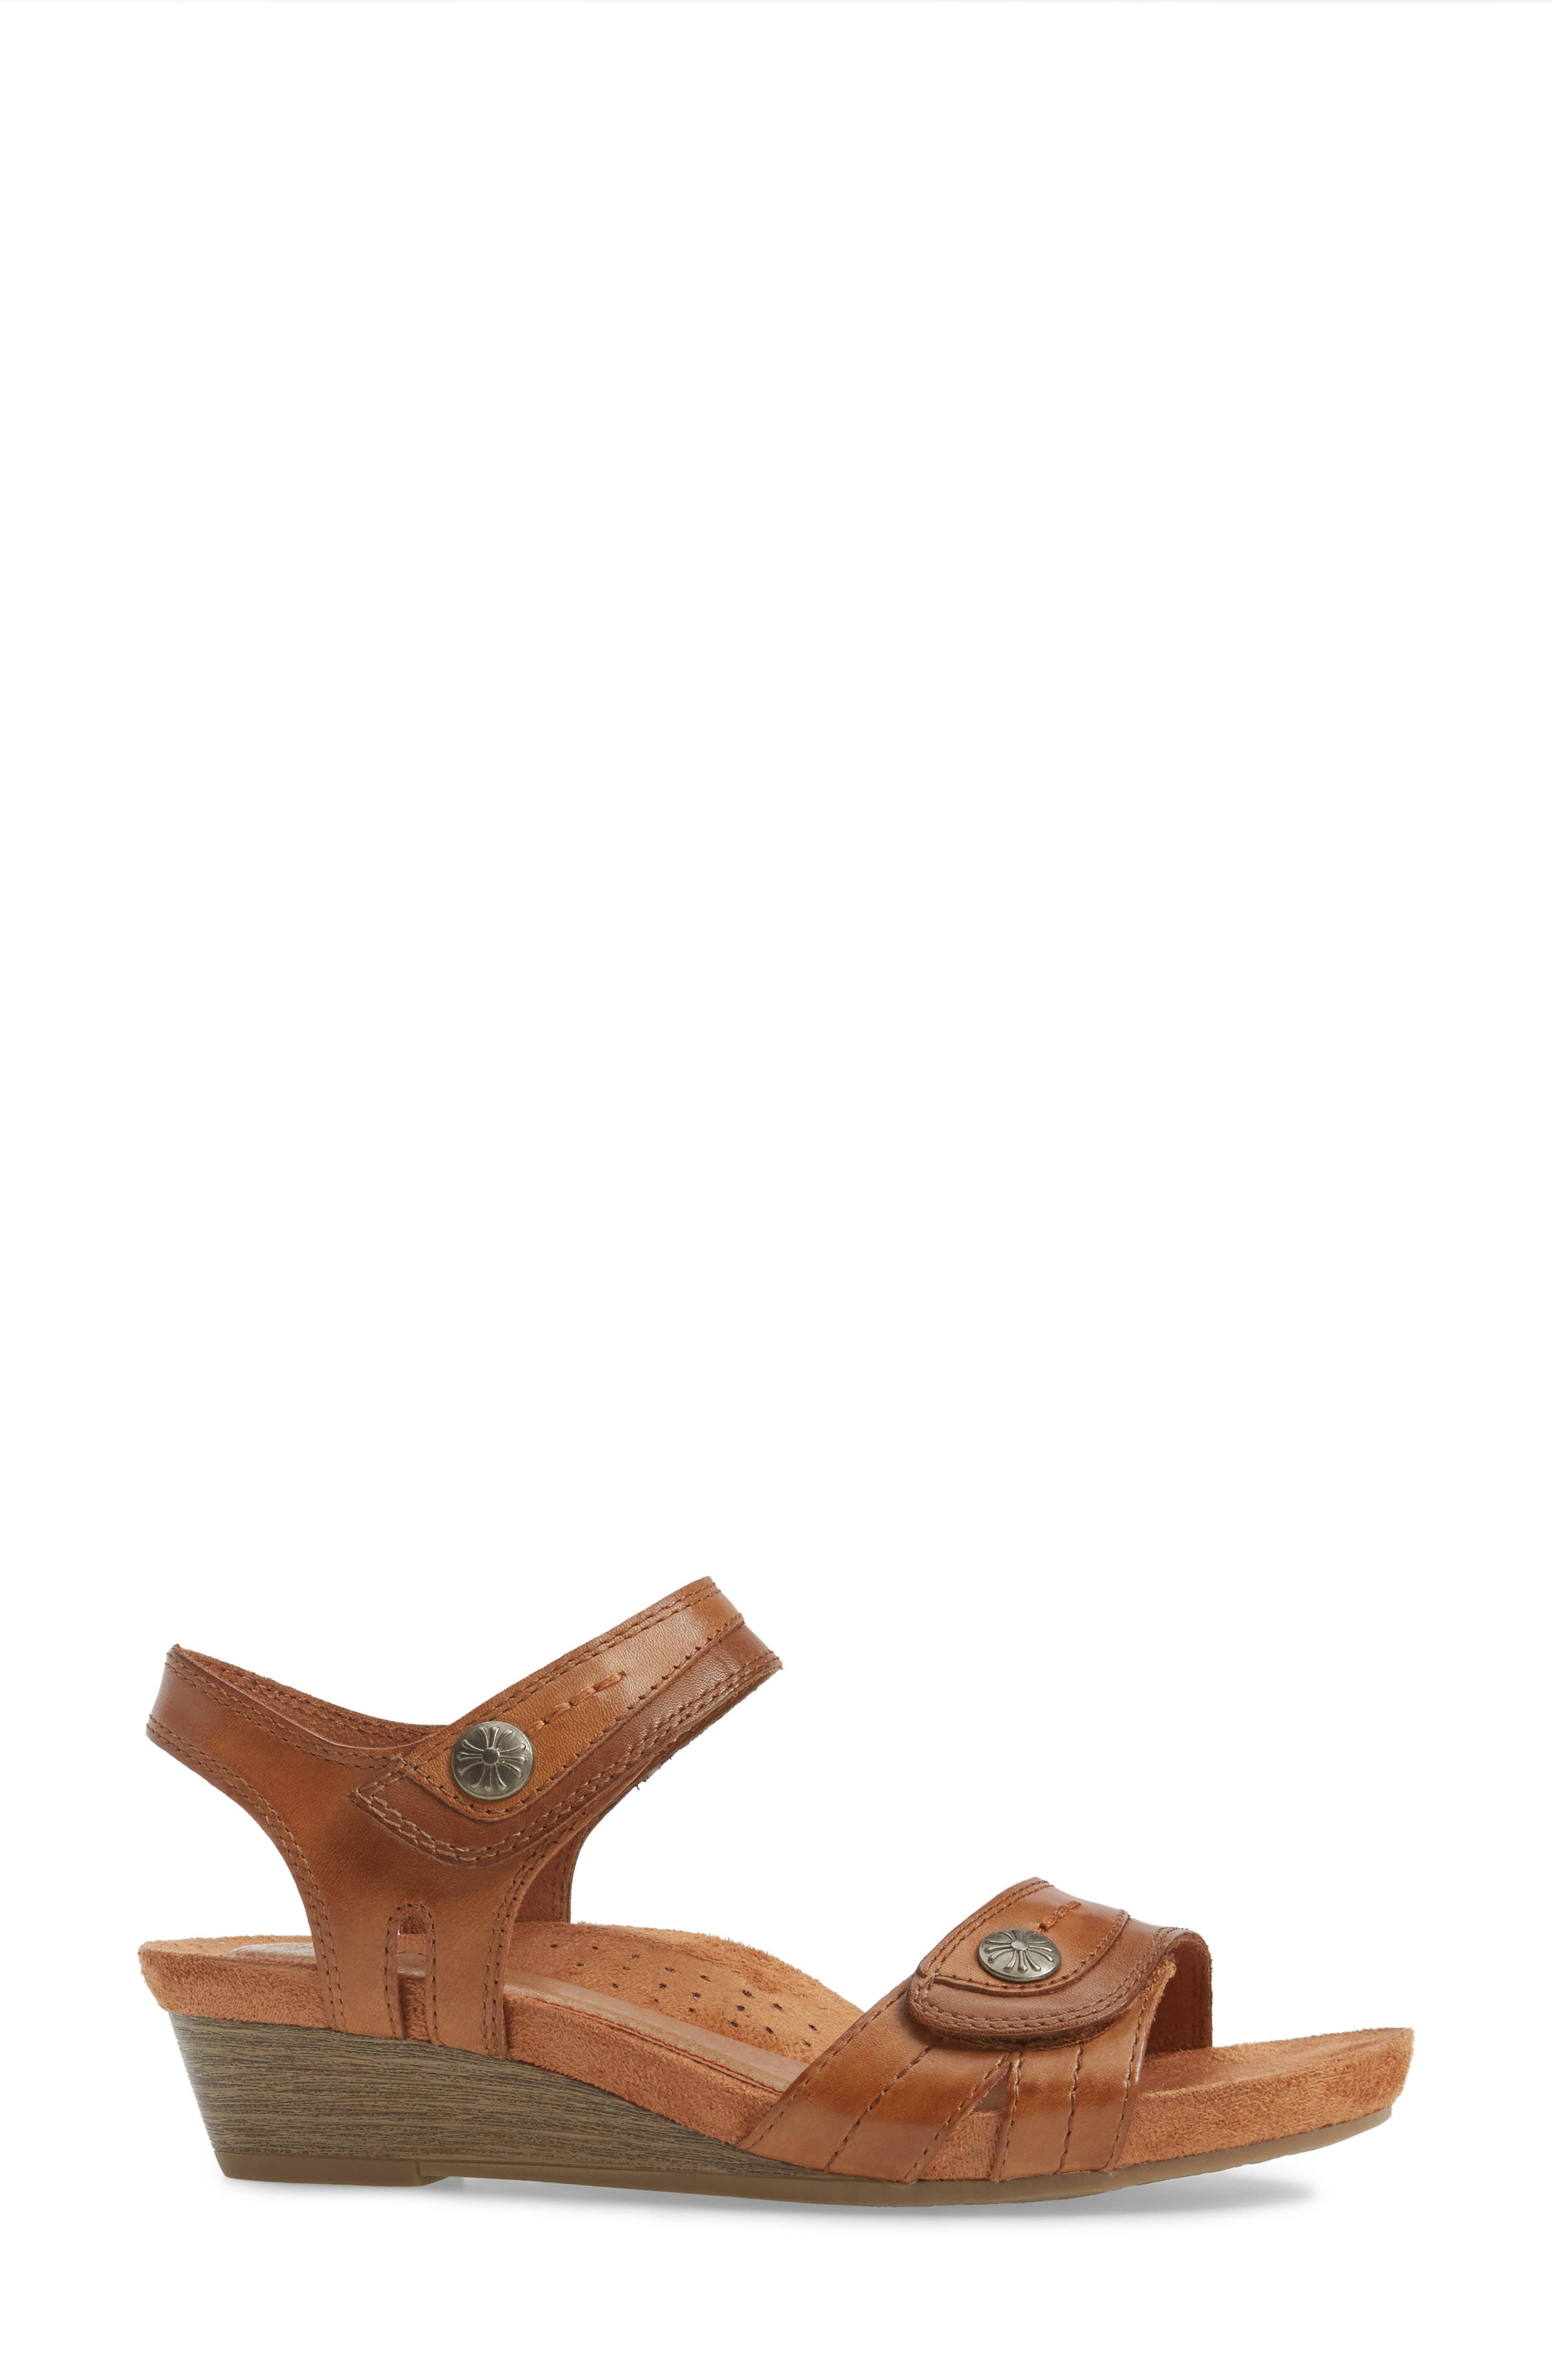 Alternate Image 3  - Rockport Cobb Hill Hollywood Wedge Sandal (Women)